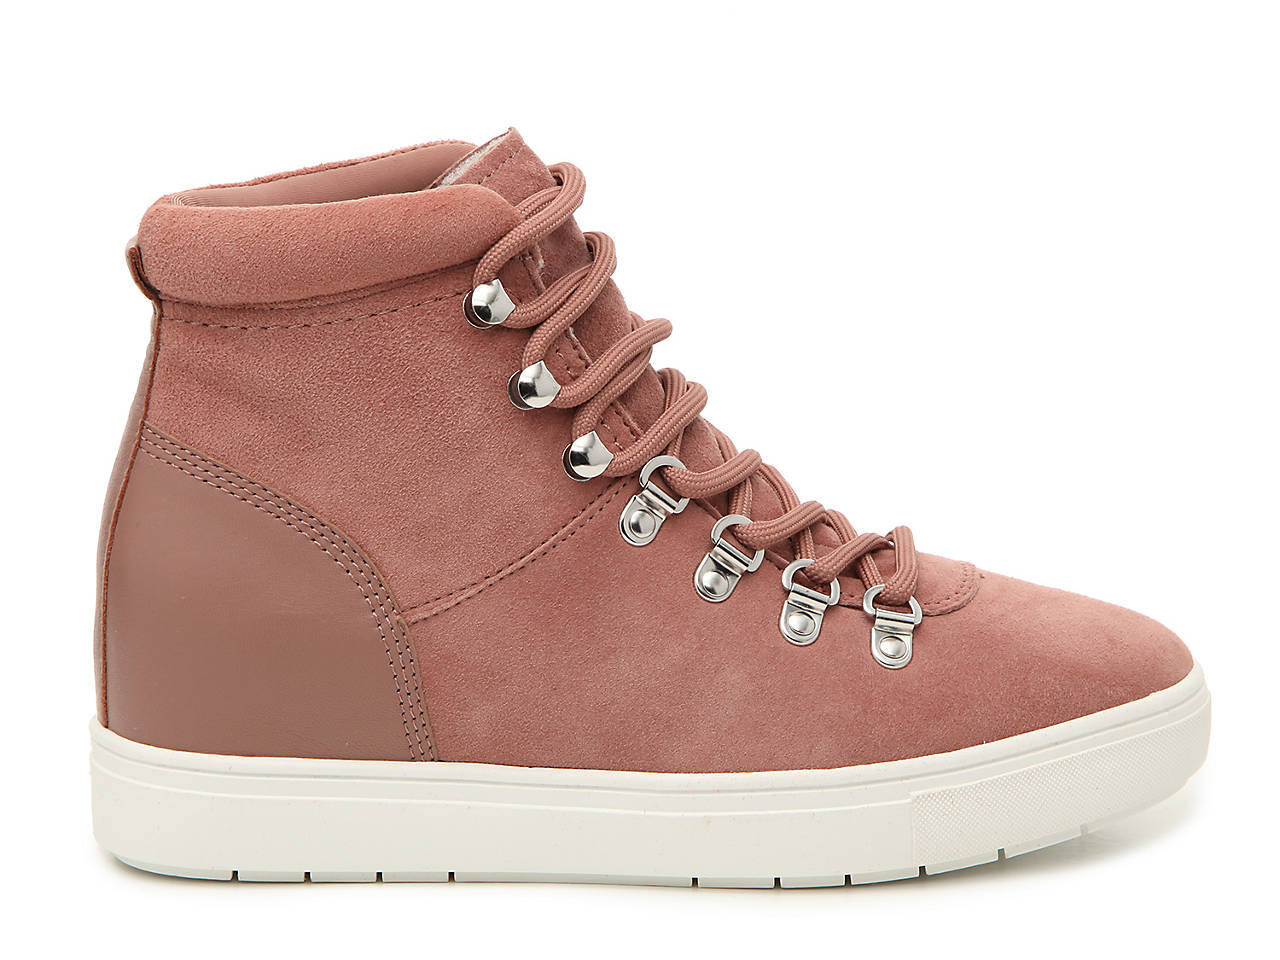 c26584ed659 Kalea Wedge High-Top Sneaker